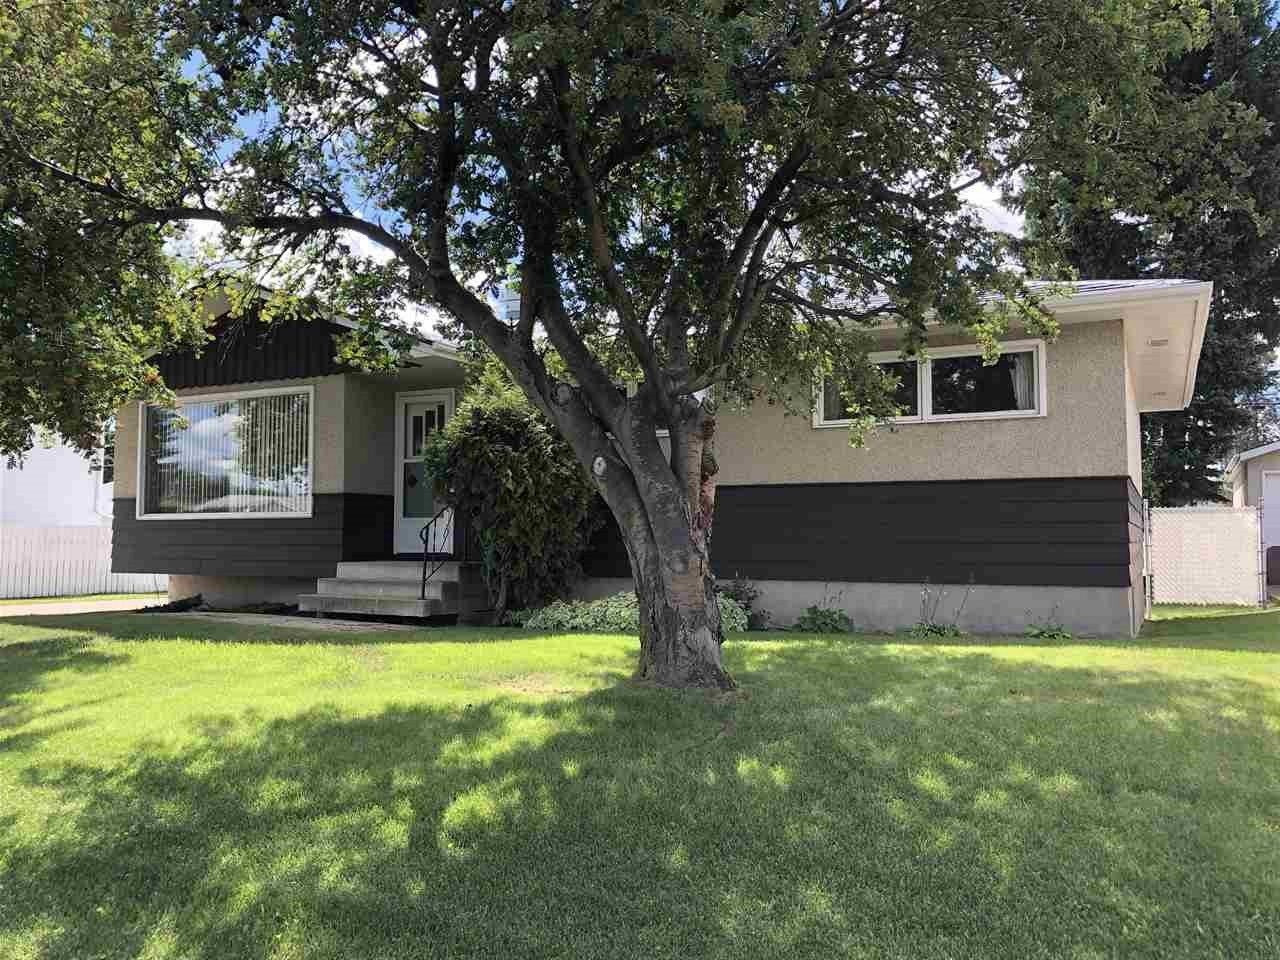 Main Photo: 16037 95 Avenue in Edmonton: Zone 22 House for sale : MLS®# E4207838